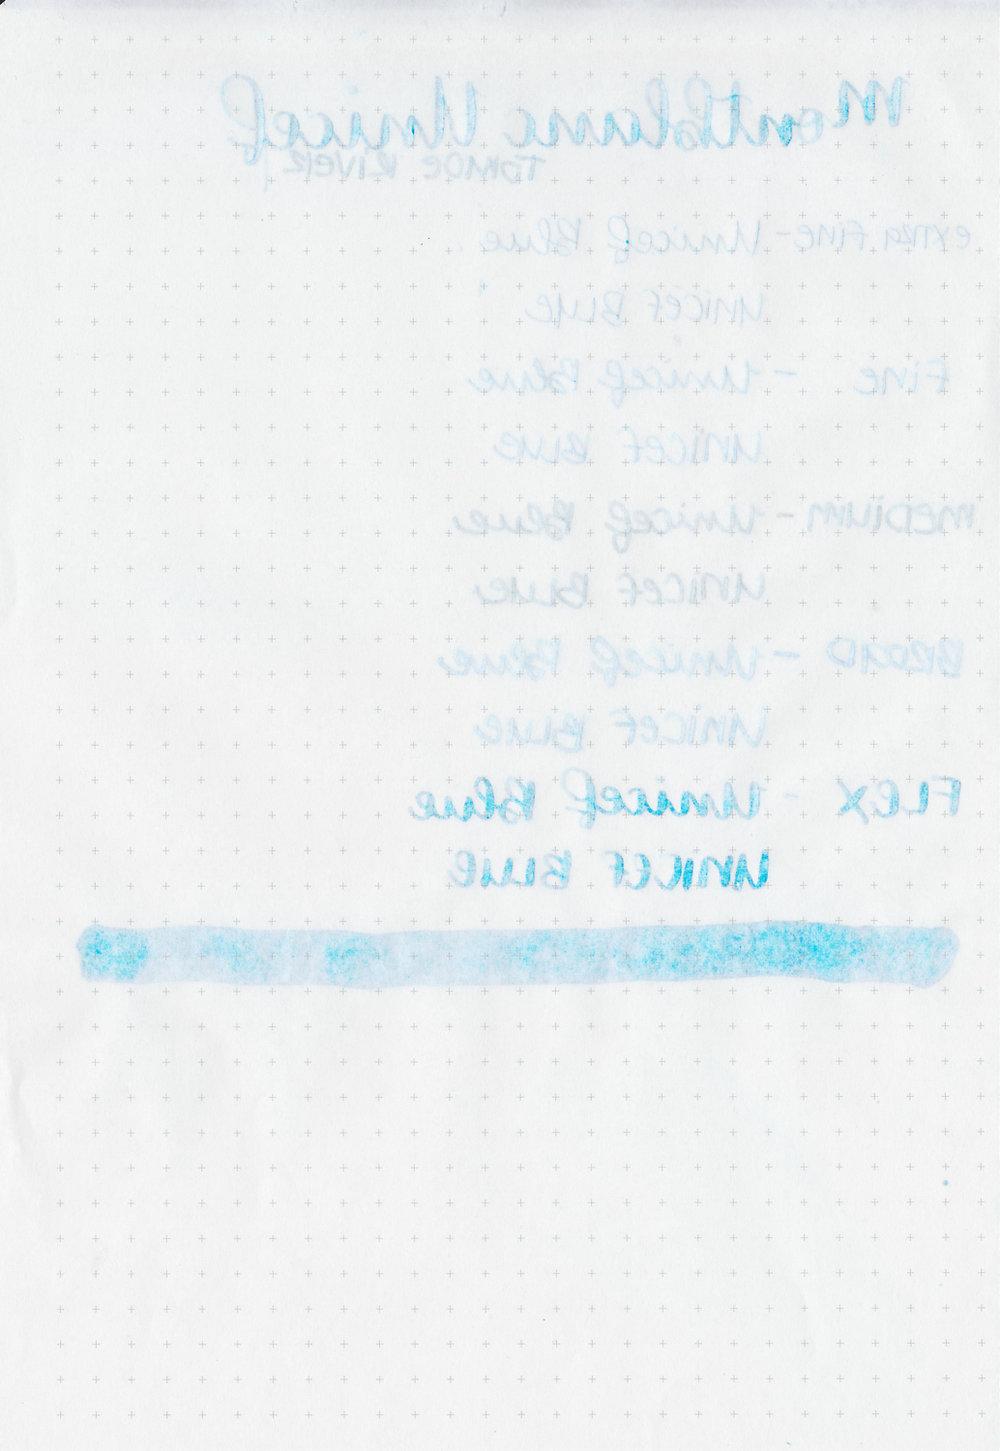 mb-unicef-8.jpg